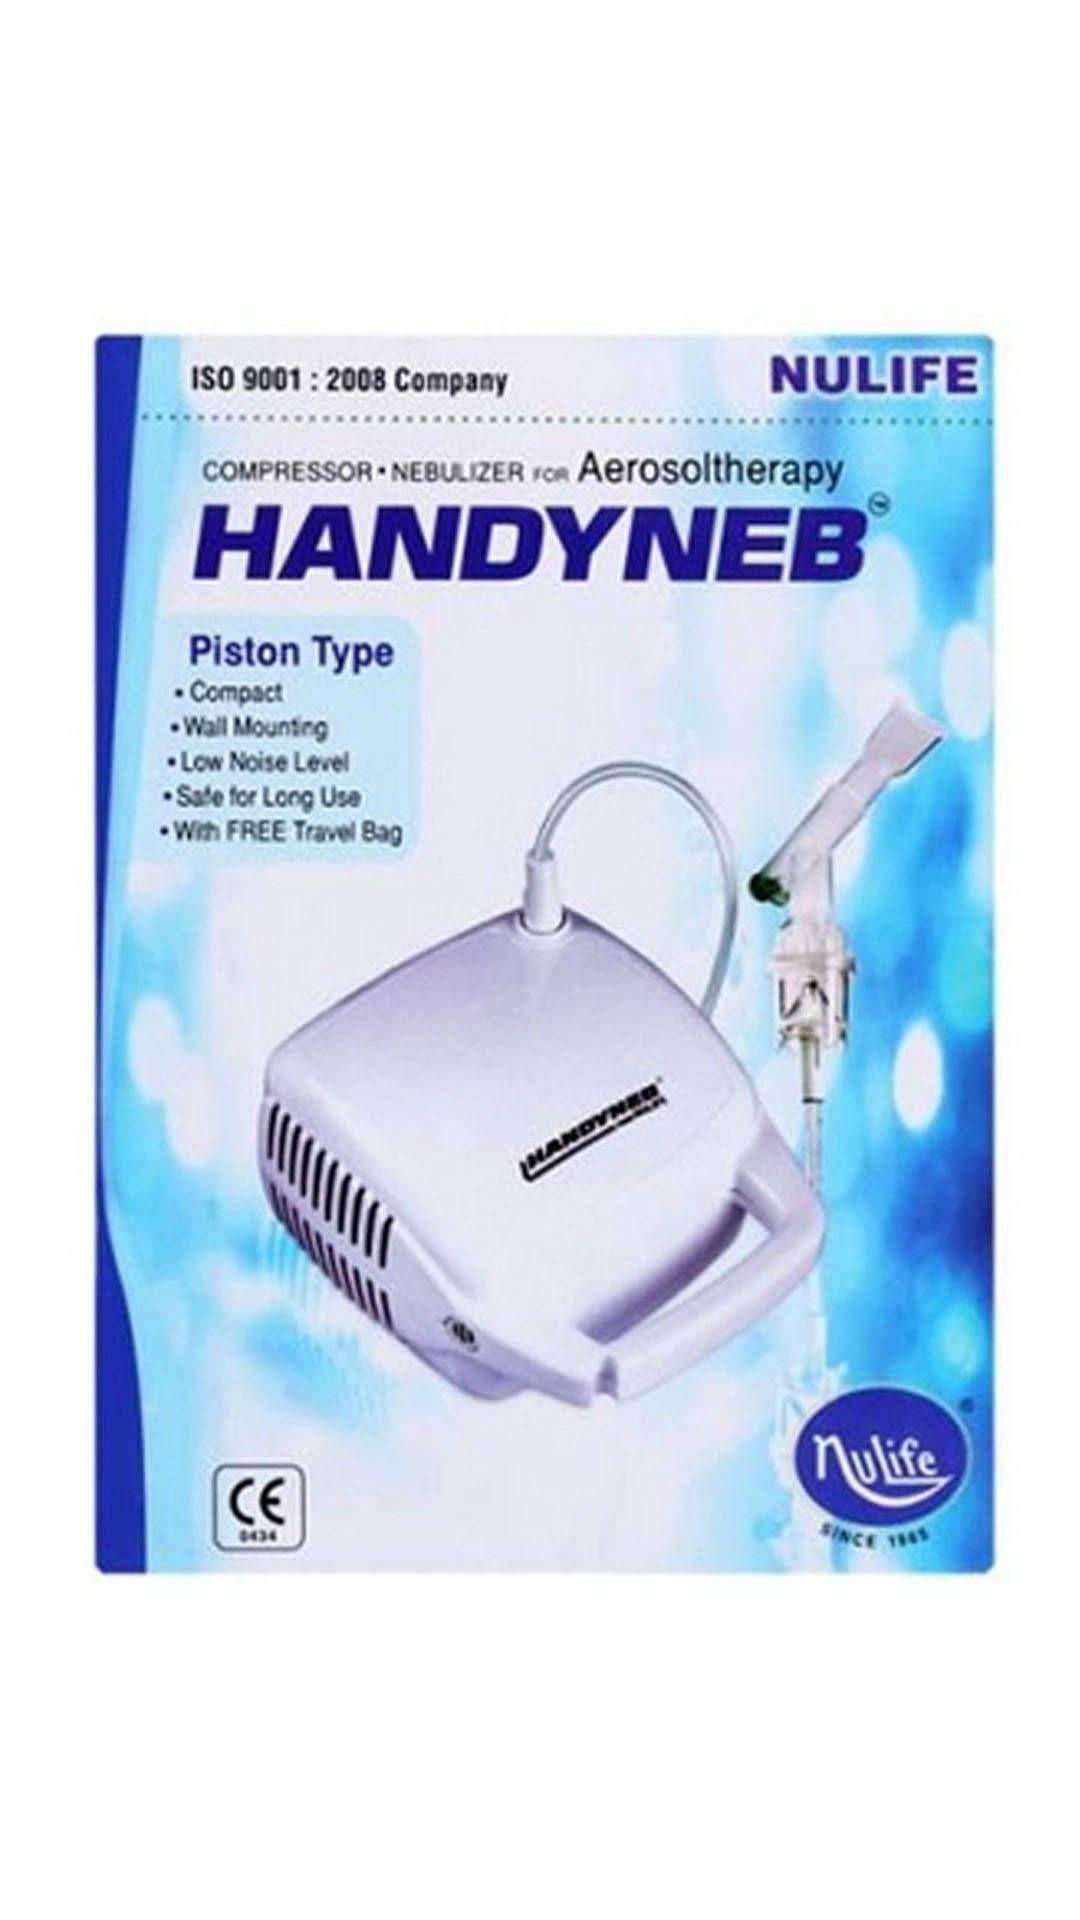 Buy Nulife Nebulizer - Piston Type